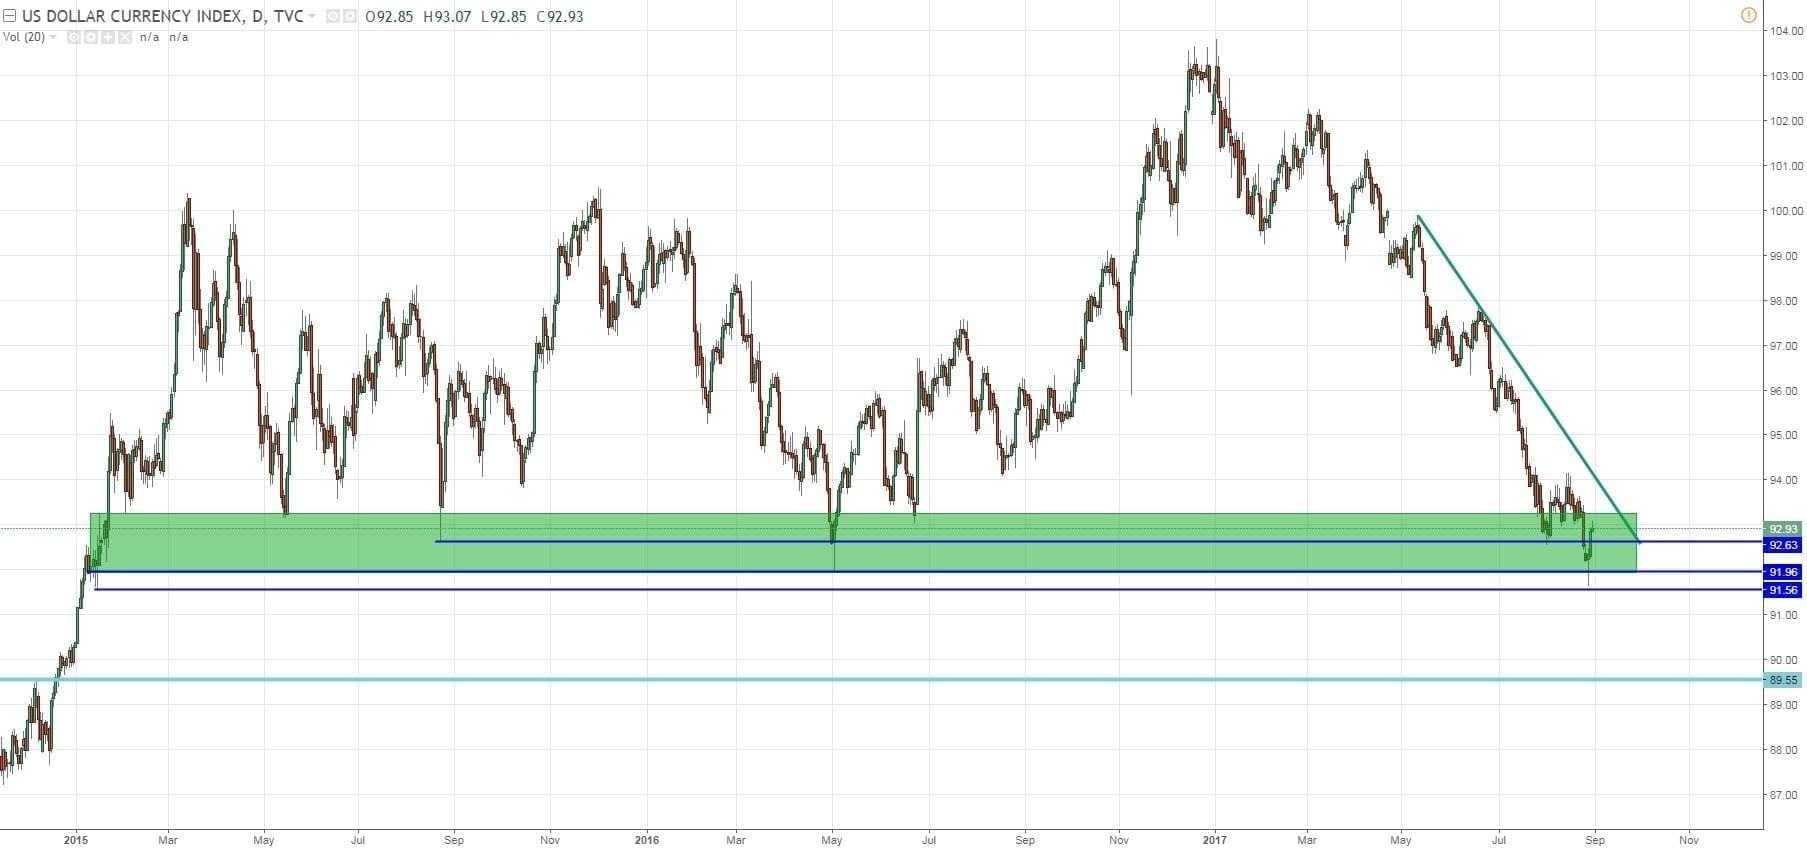 Dollar Index 31 Aout 2017